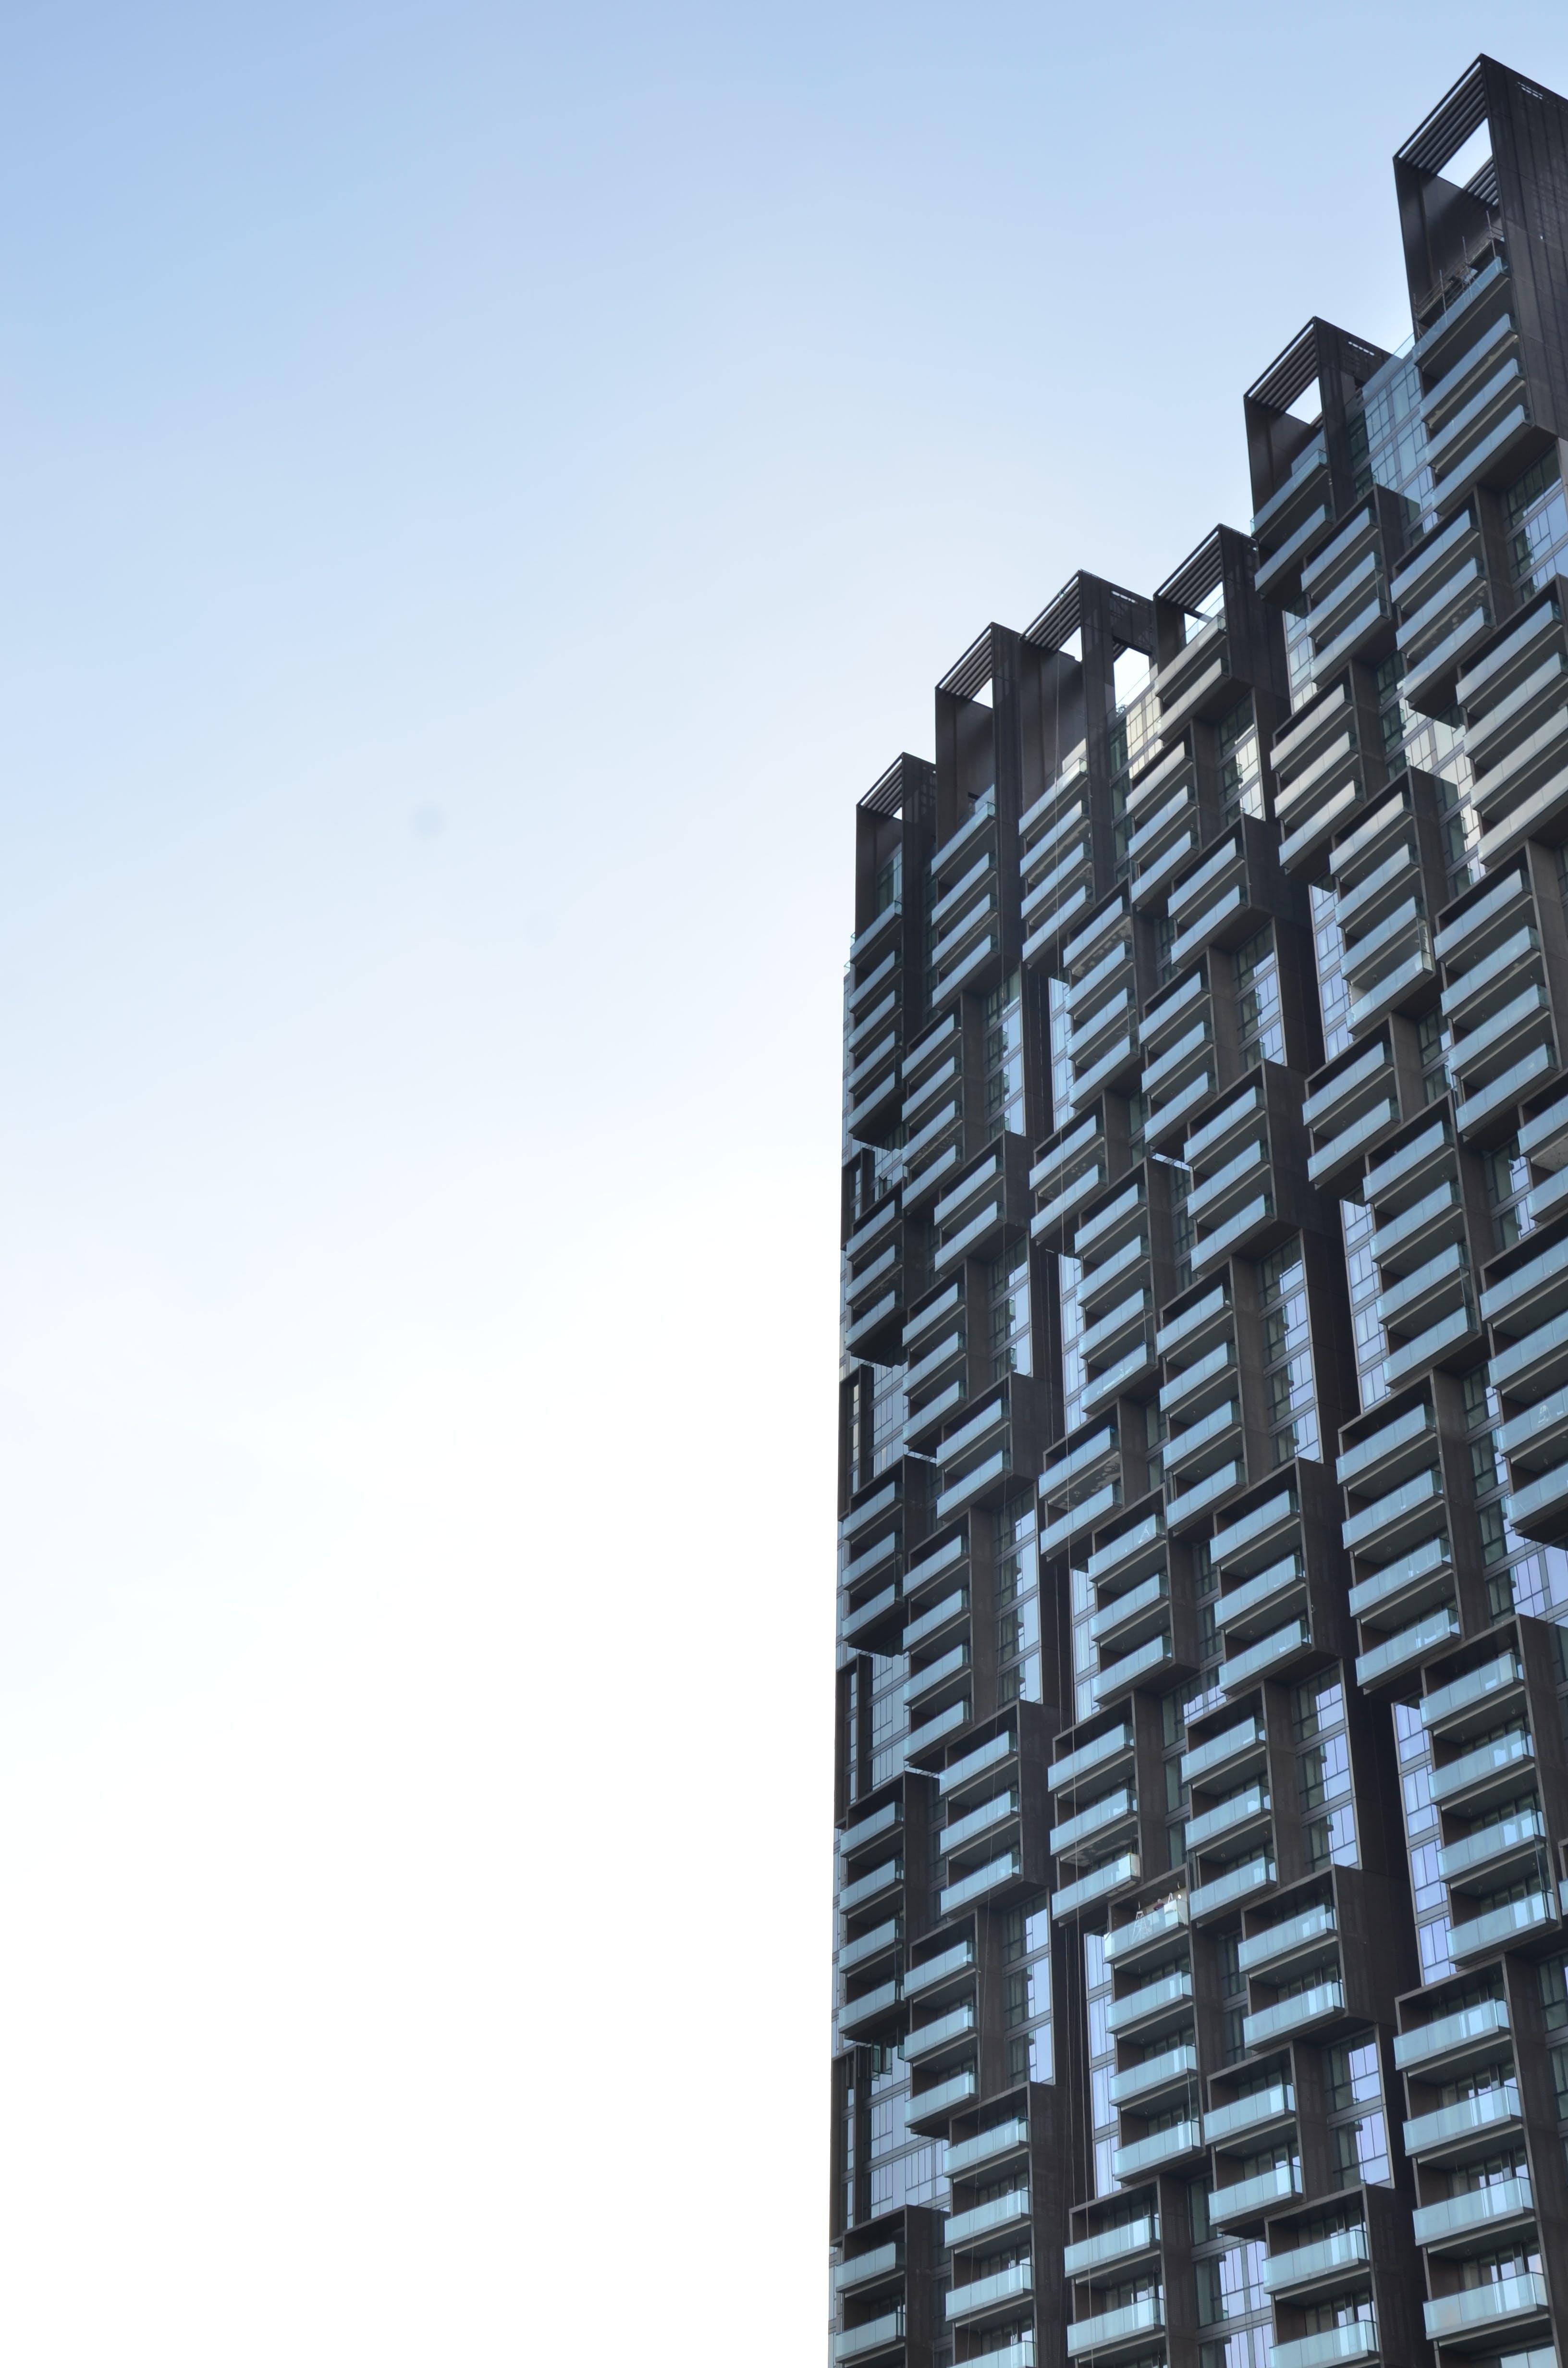 Free stock photo of #city #street #citylife #building #architecture, #moody #singapore